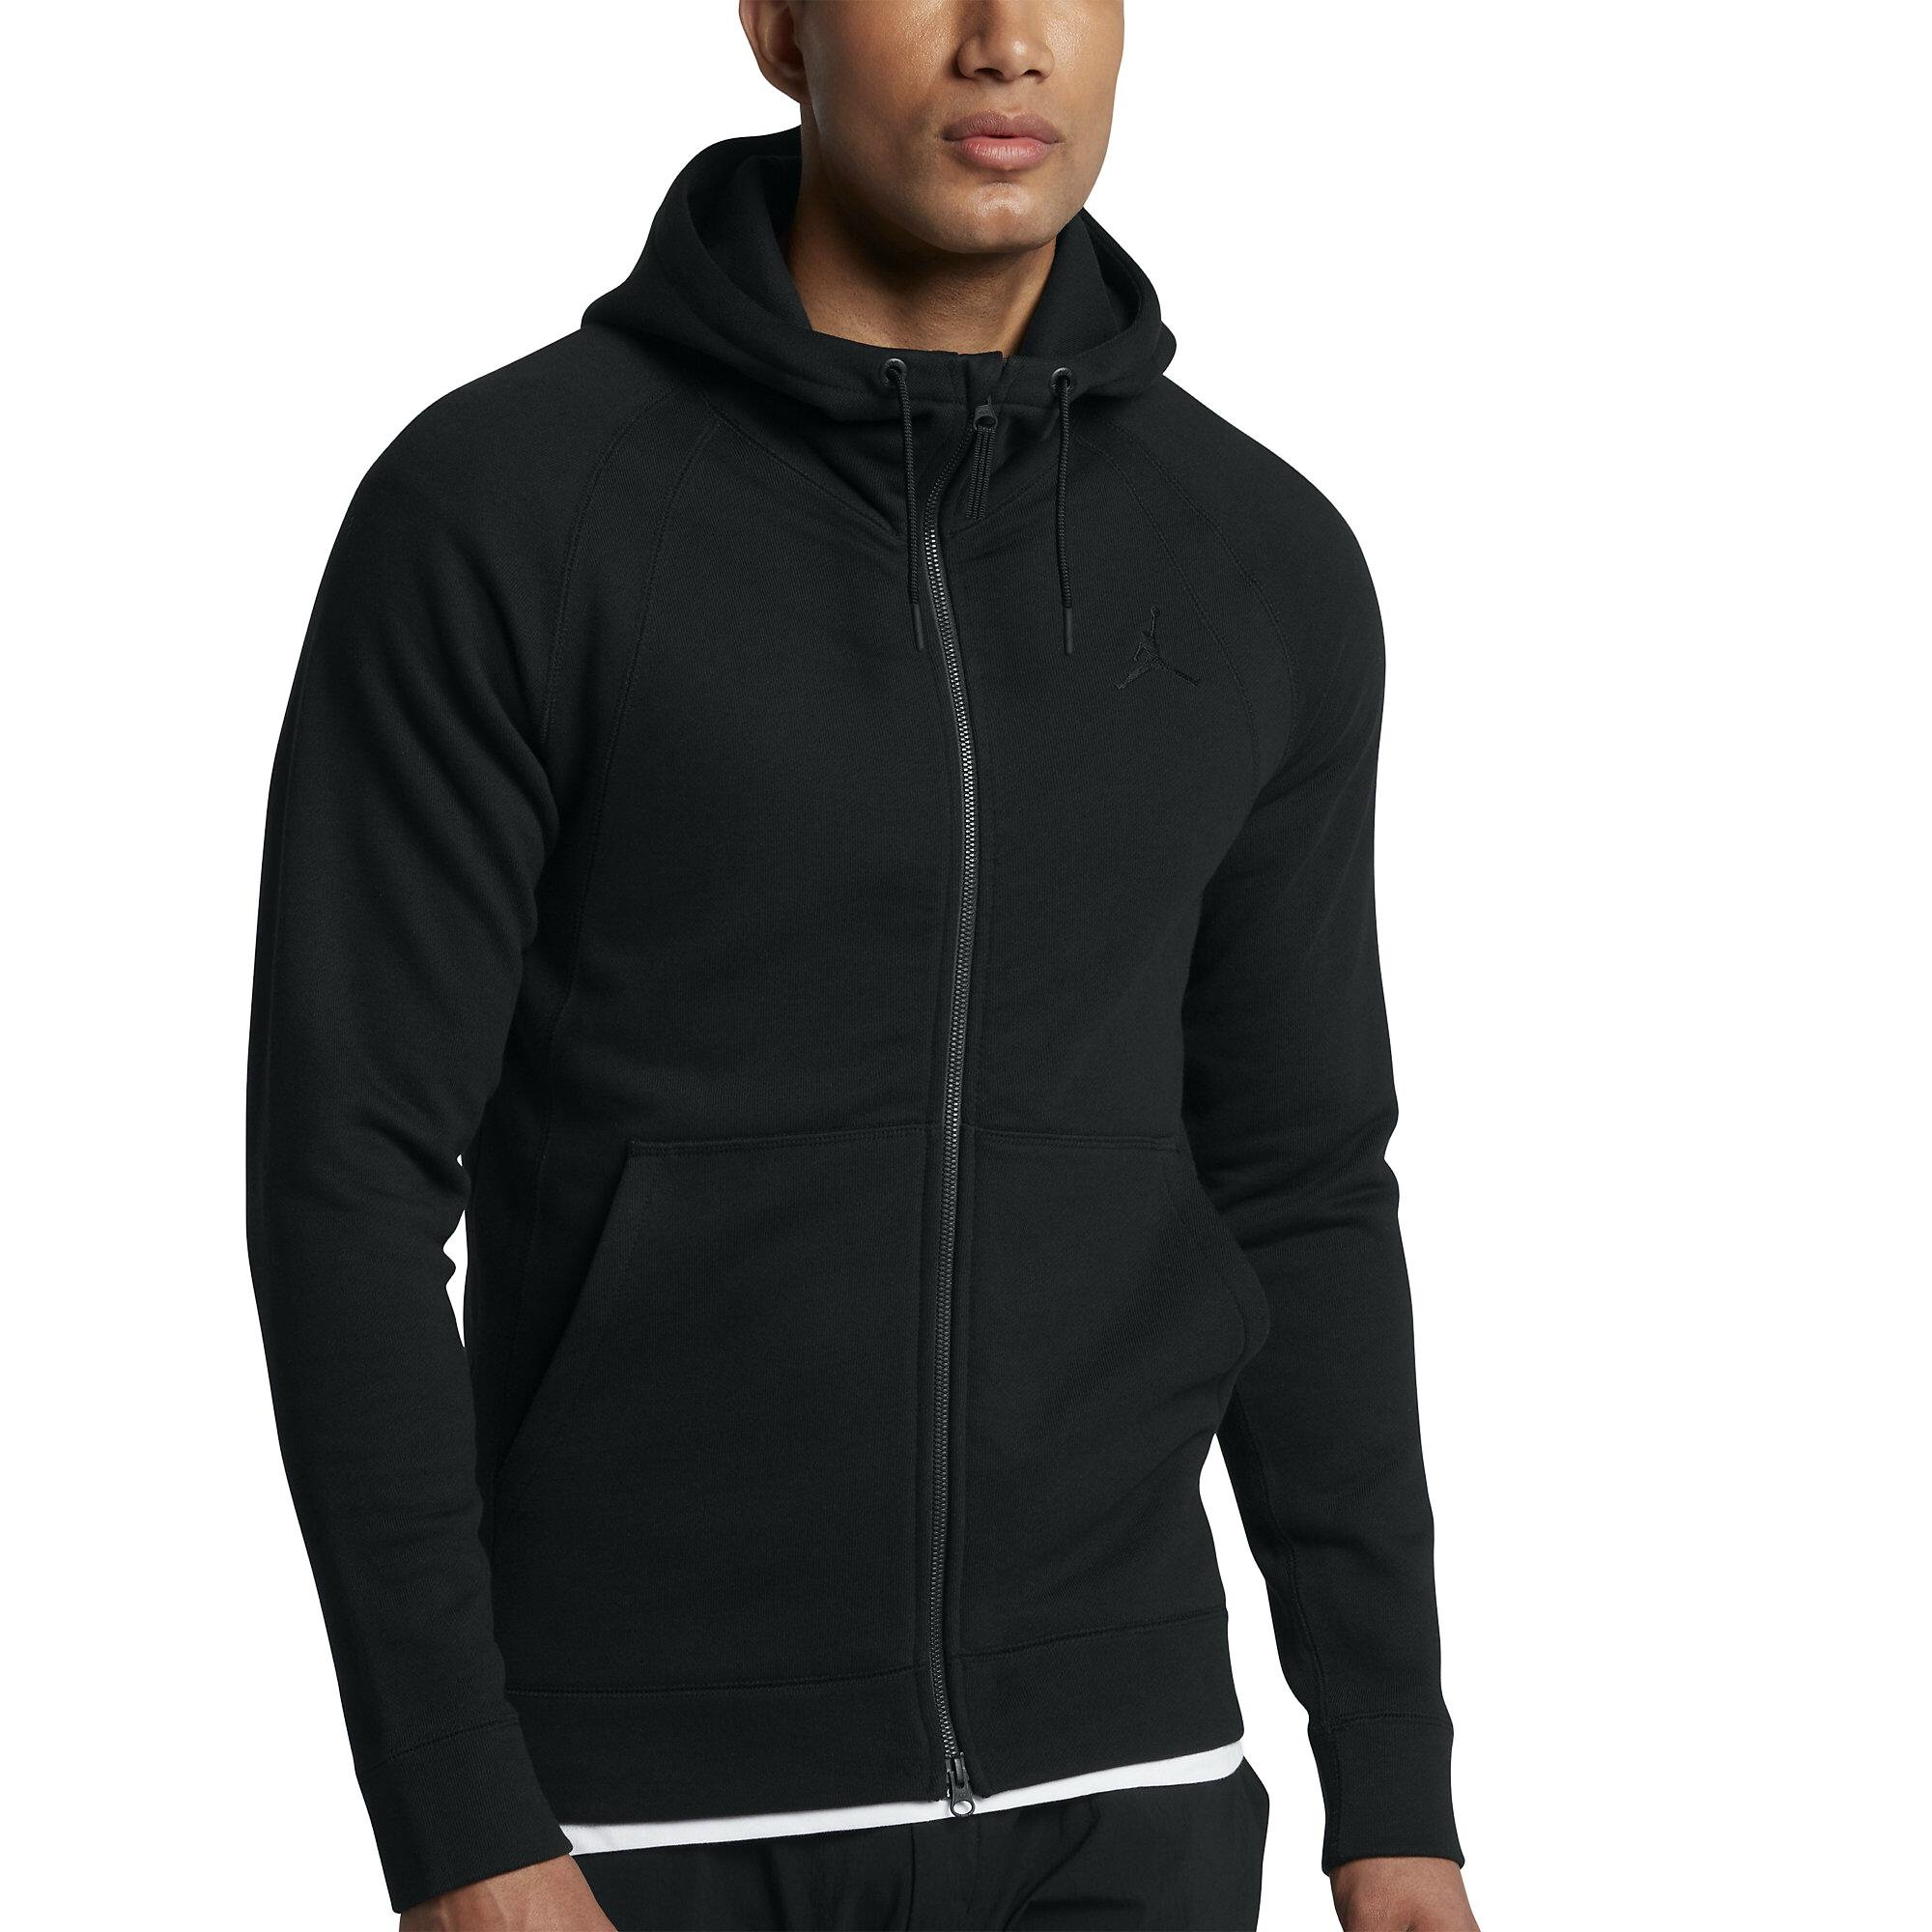 Jordan Sportswear Wings Fleece Full Zip Hoodie Mens Style : 860196